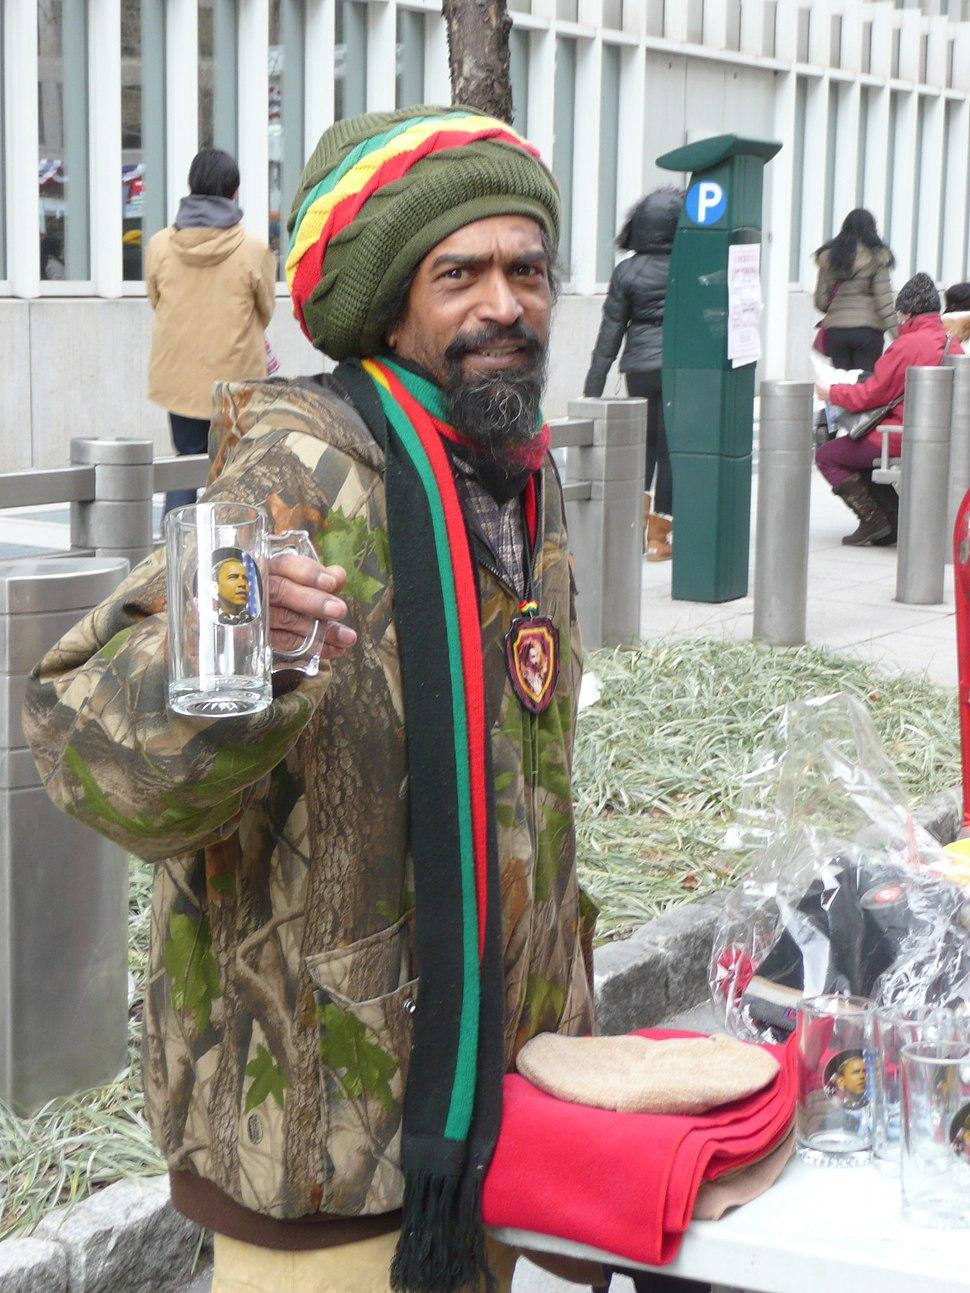 Rasta vendor with hat and glass Obama mug Inauguration 2013